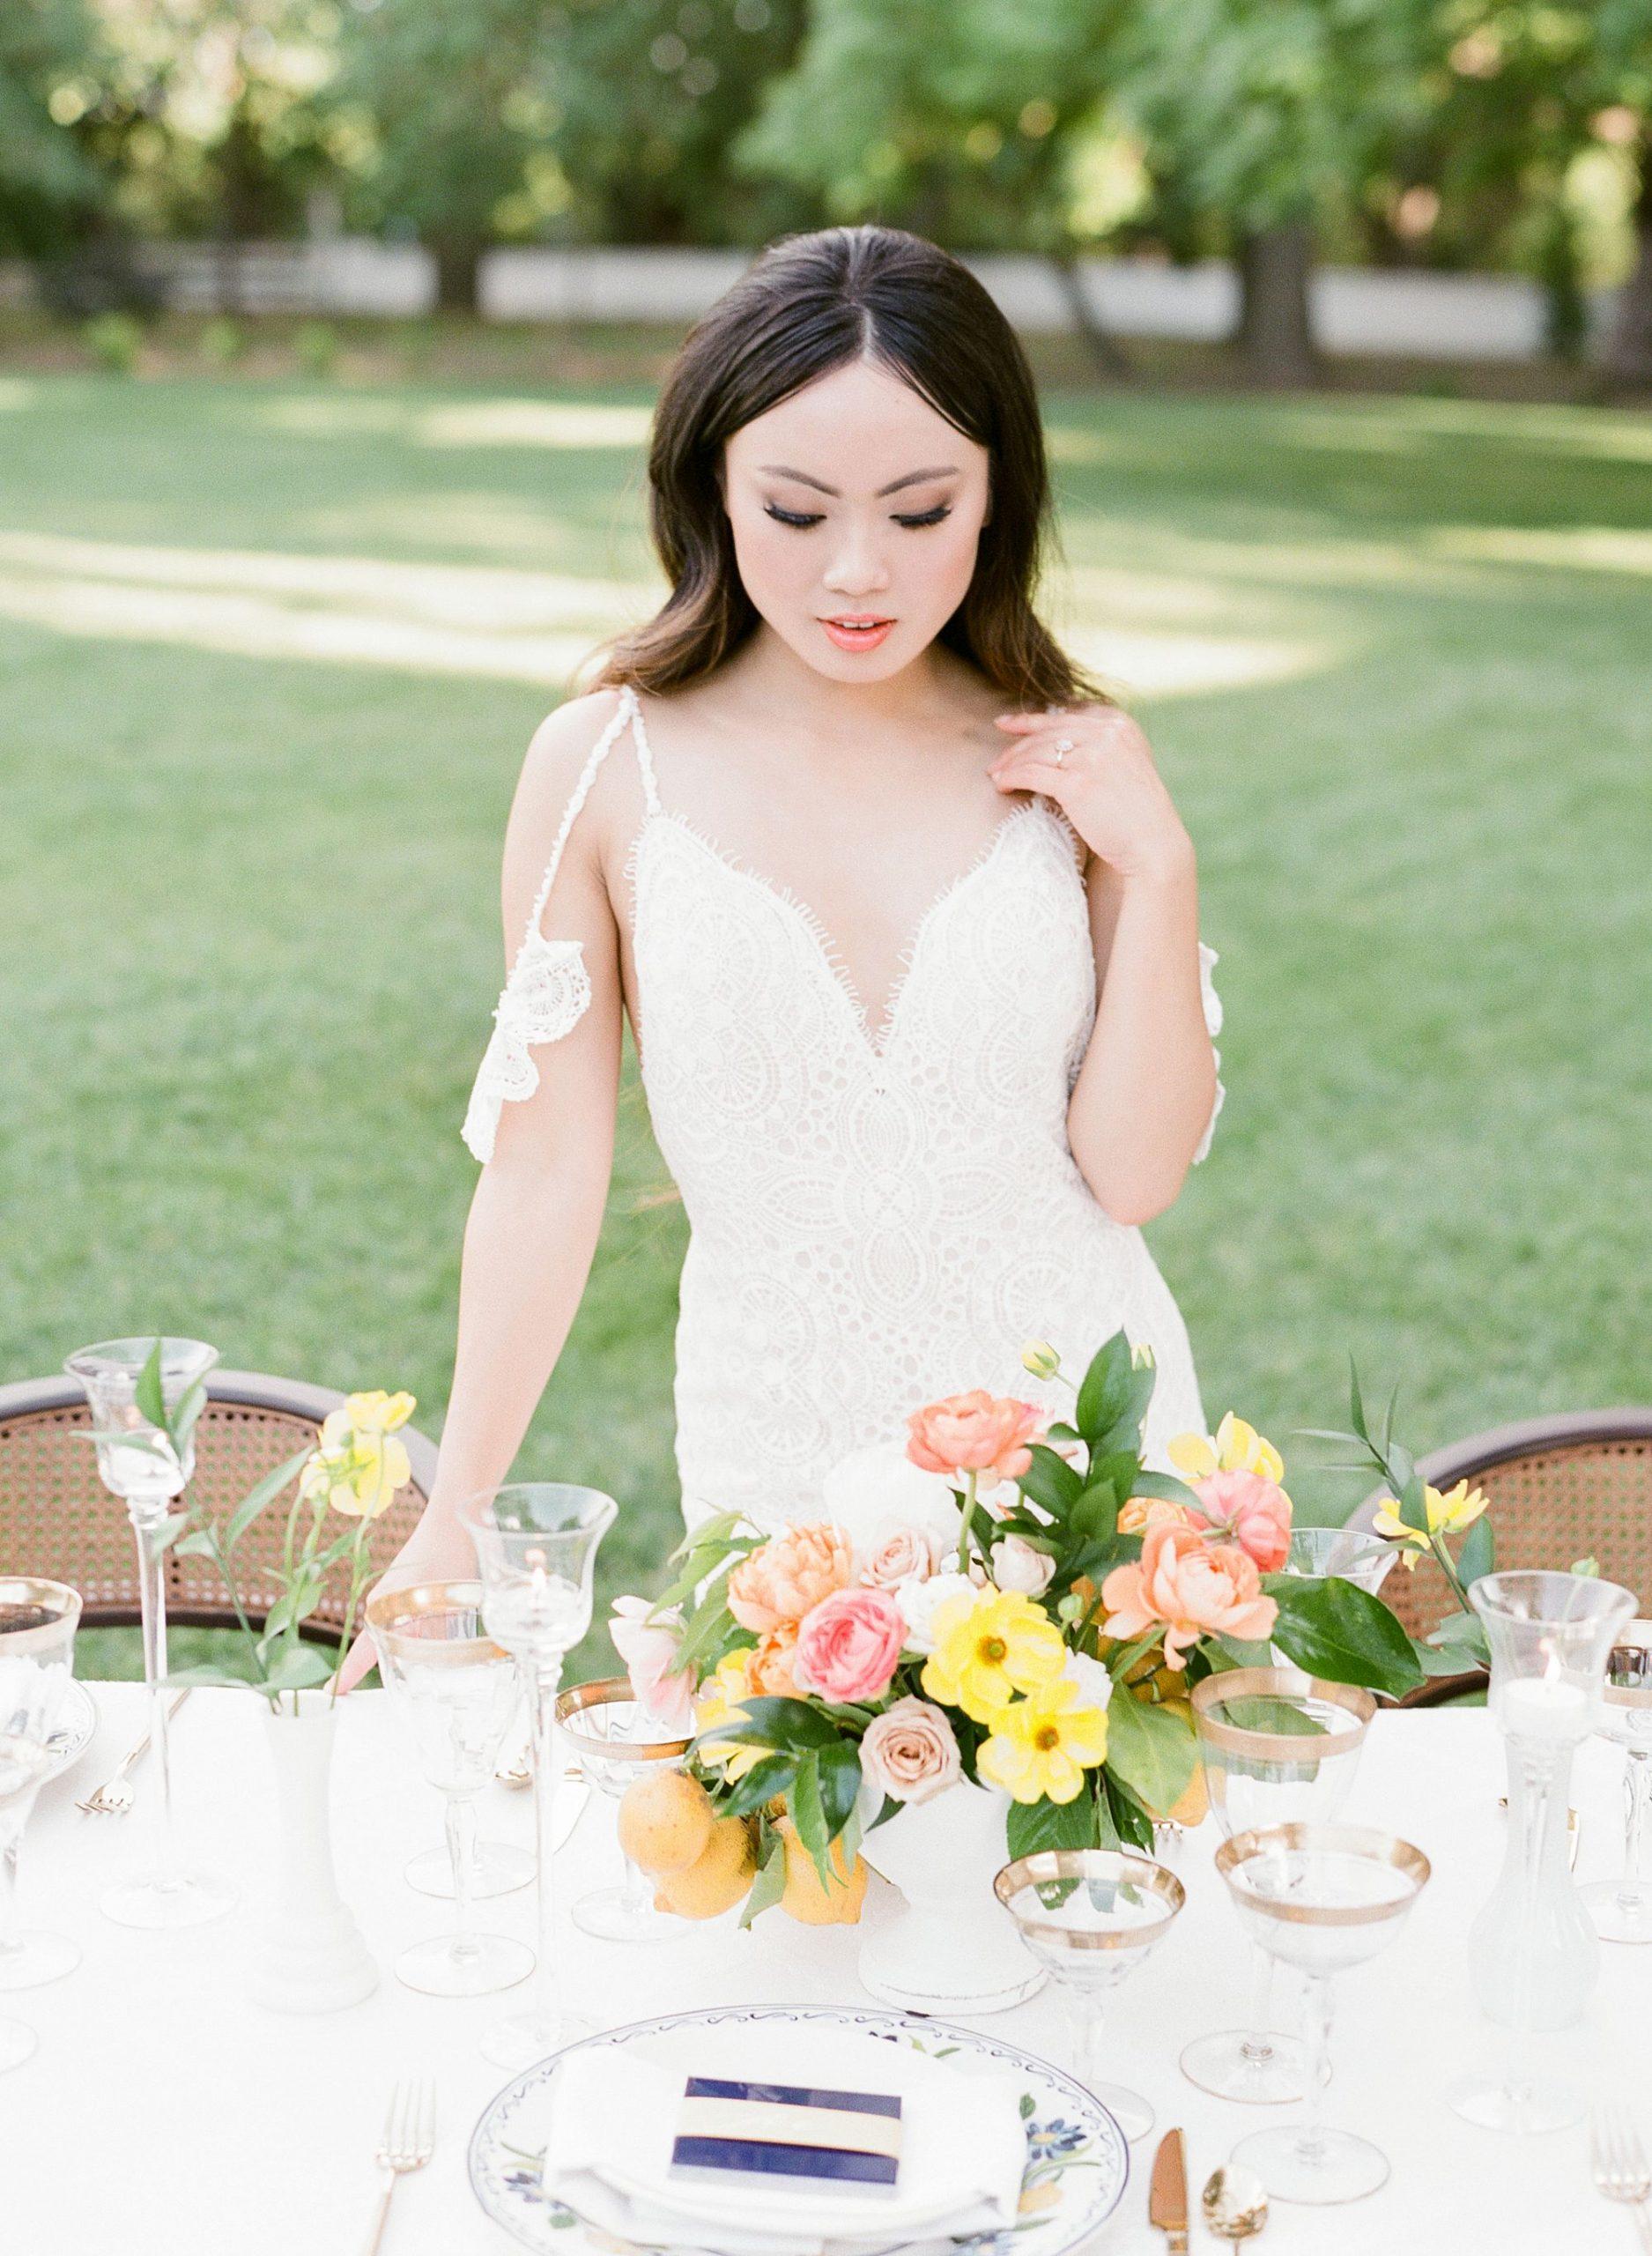 Italian Wedding Inspiration at The Maples Wedding & Event Center - Featured on Wedding Chicks - Ashley Baumgartner - Sacramento Wedding Phtoographer_0027.jpg